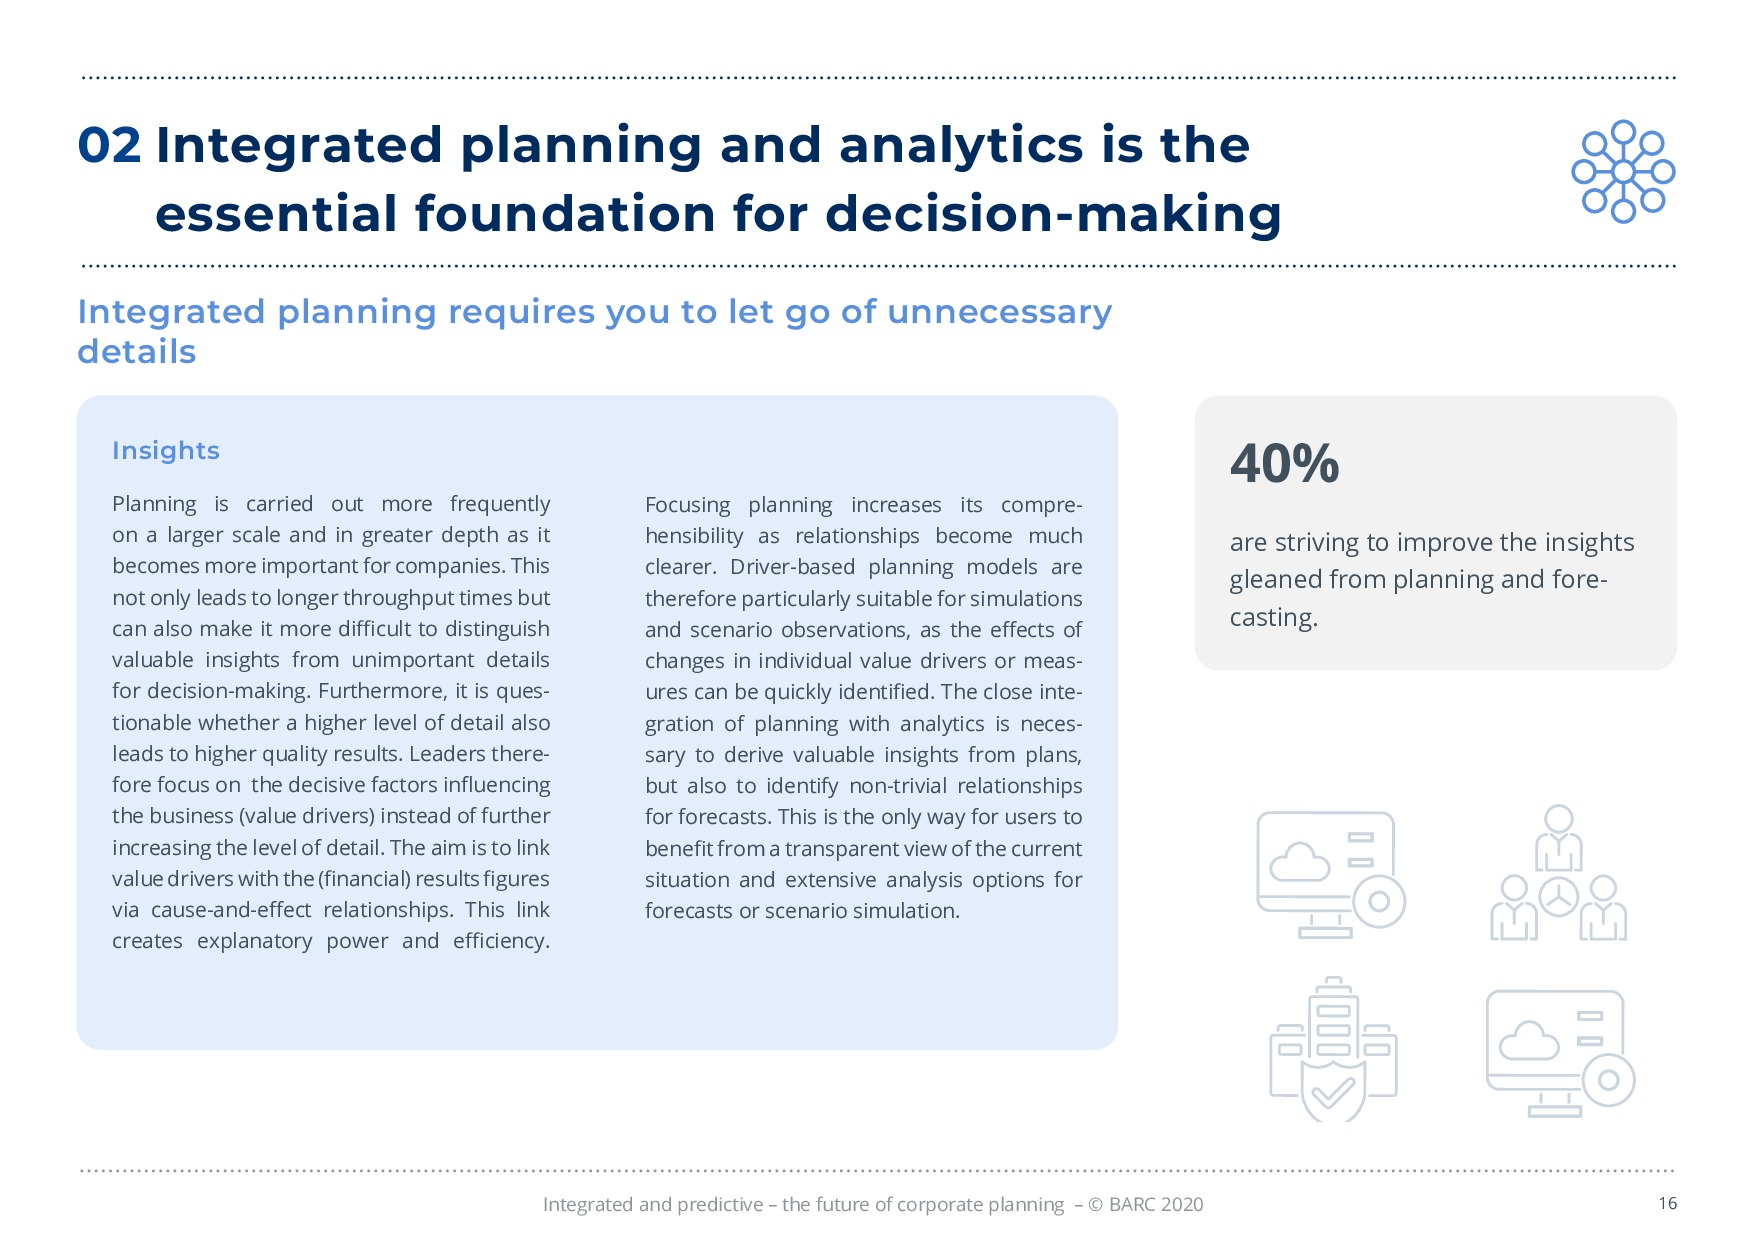 BARC – 統合と予測 – 経営計画の未来 | Page 16